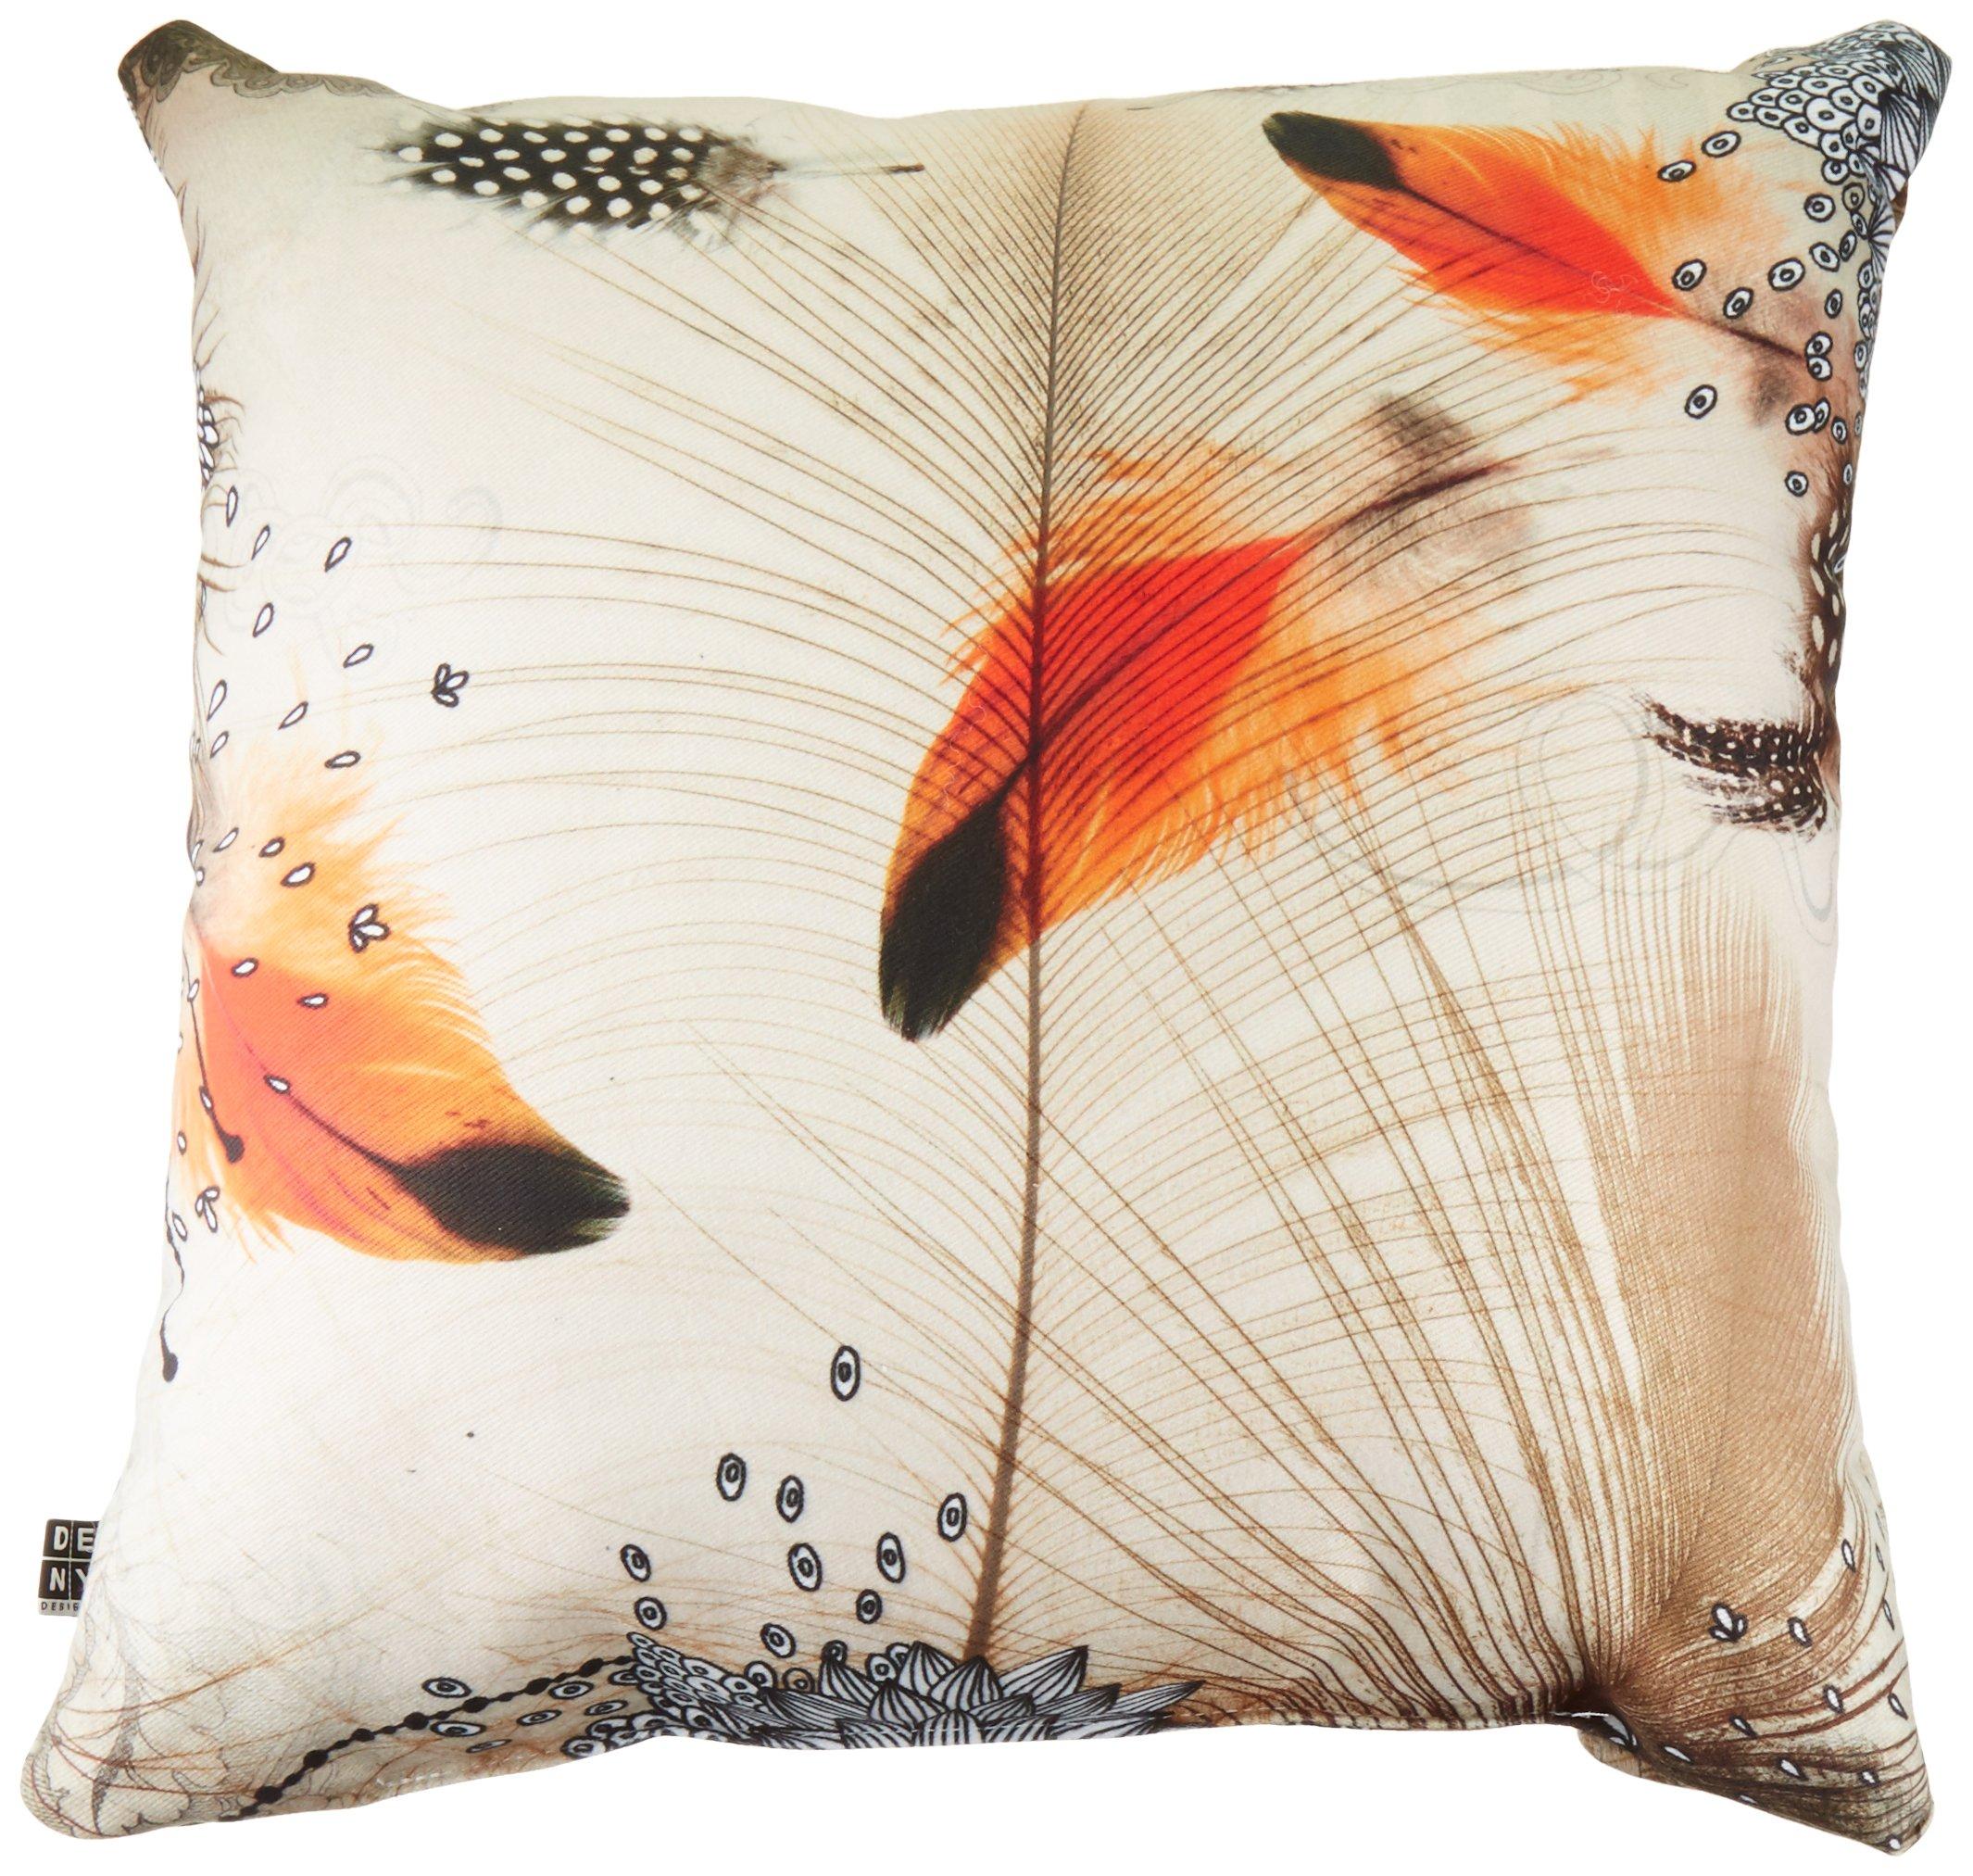 16 x 16 Deny Designs Iveta Abolina Feathered Arrows Outdoor Throw Pillow